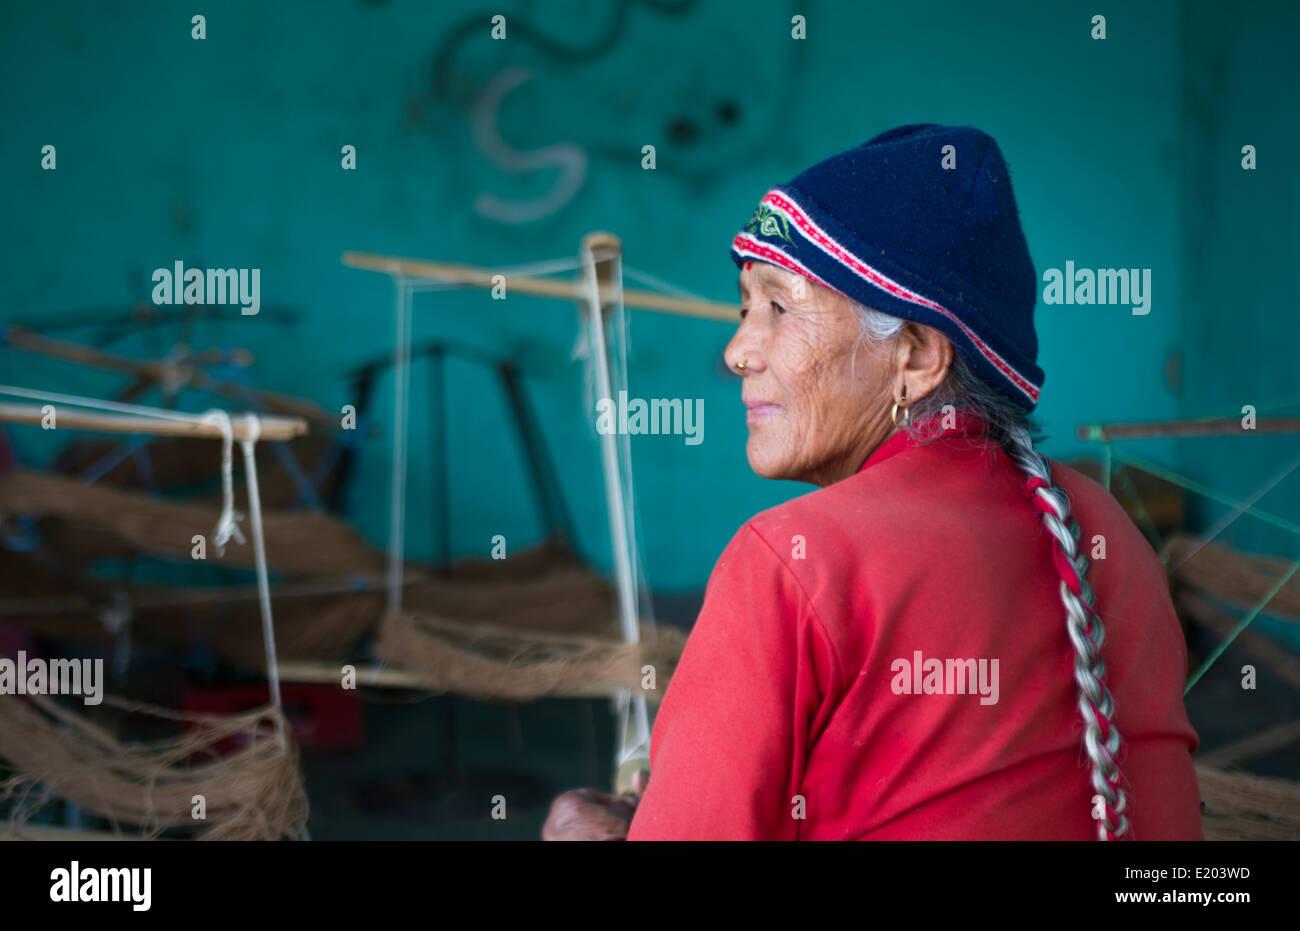 Nepal. Nepali weaving woman, posing and weaving threads for carpets. Nayapati, Eastern Kathmandu. 43 - Stock Image